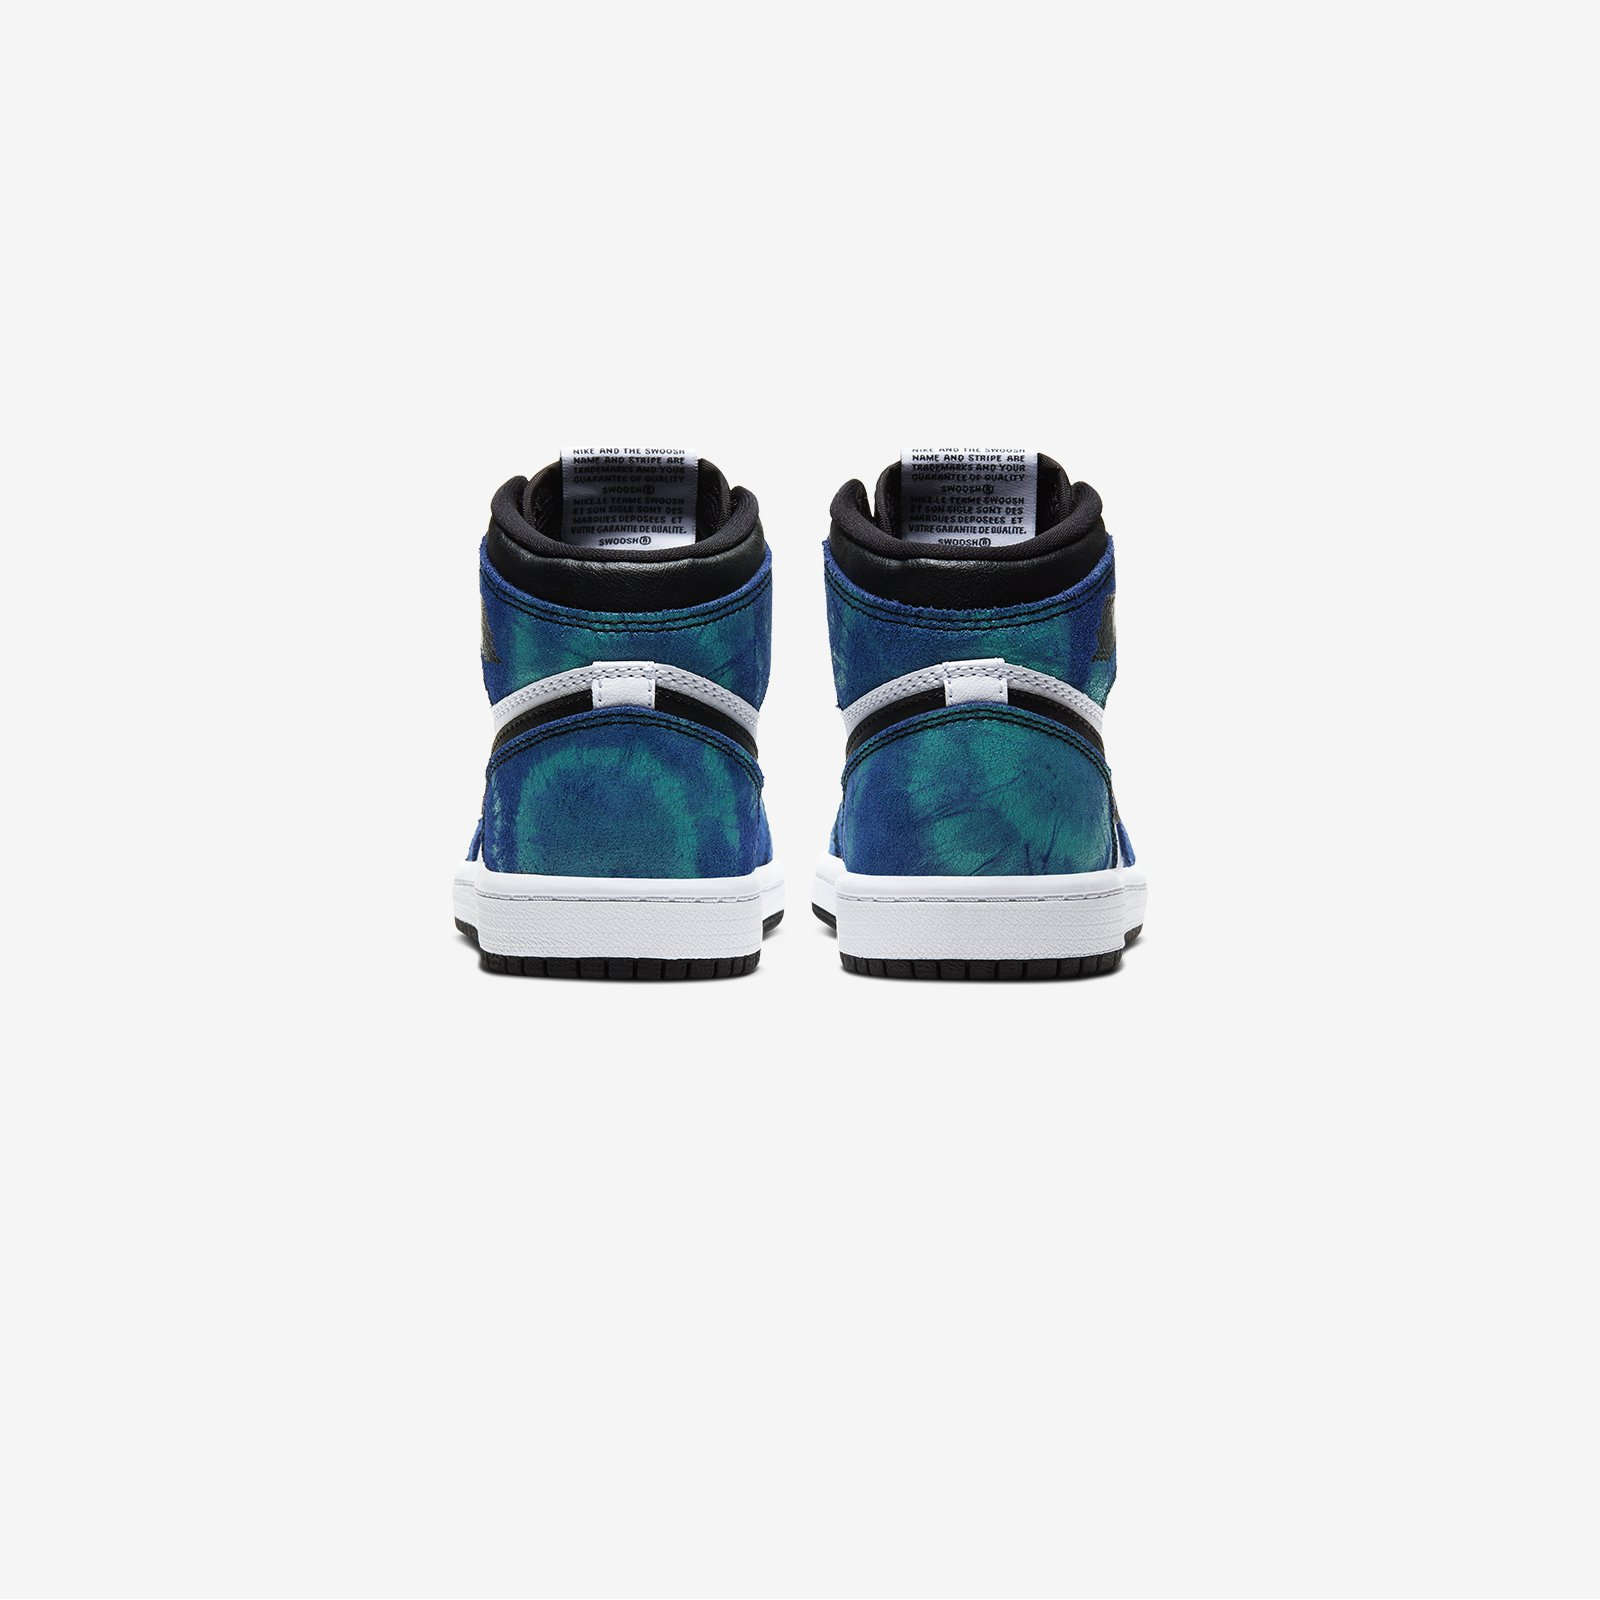 Air Jordan 1 Retro High OG PS 'Tie-Dye'